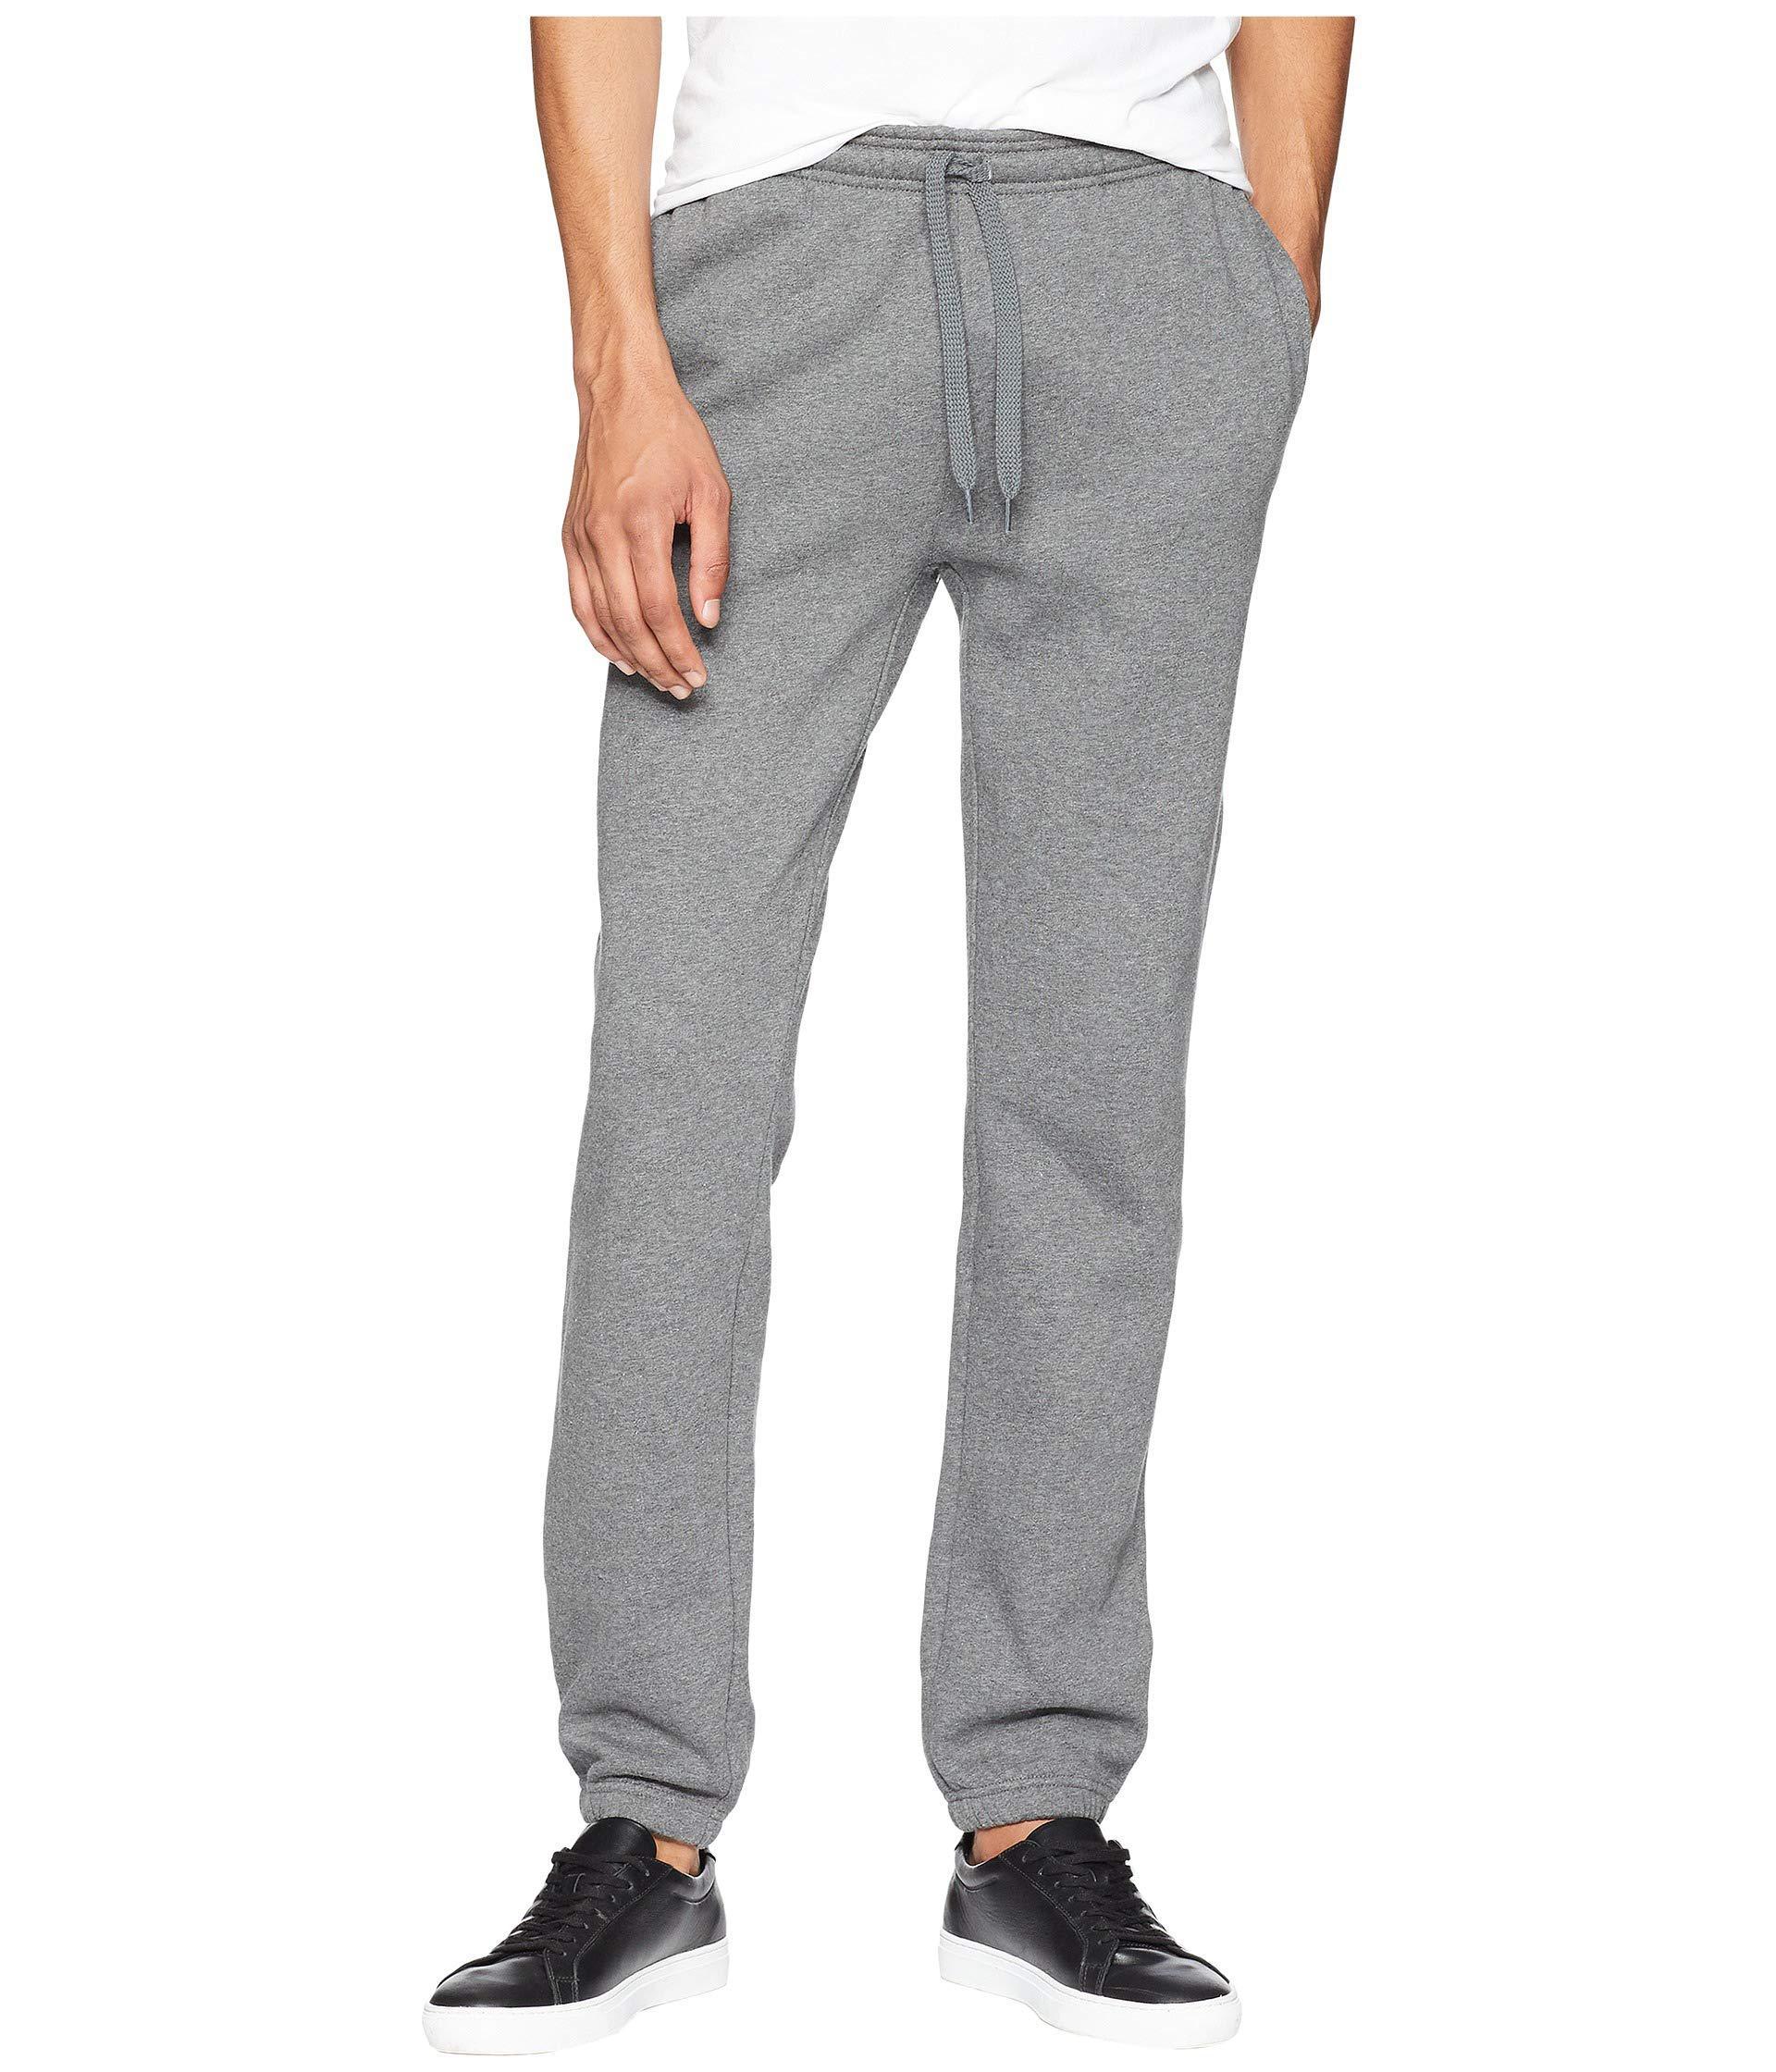 Lyst - Lacoste Sport Fleece Tennis Pants (pitch) Men s Casual Pants ... 9fc39077207b